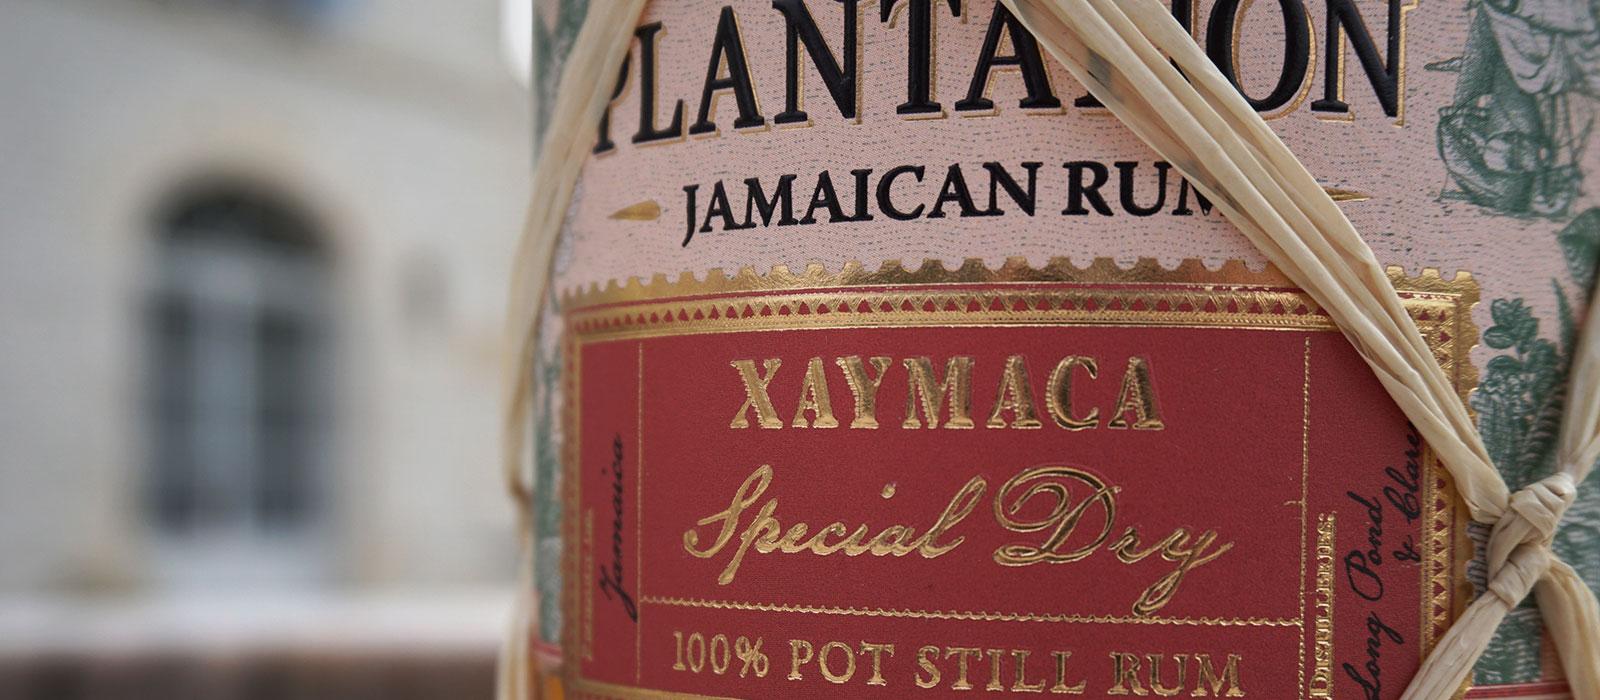 Silver 2019: Plantation Xaymaca Special Dry